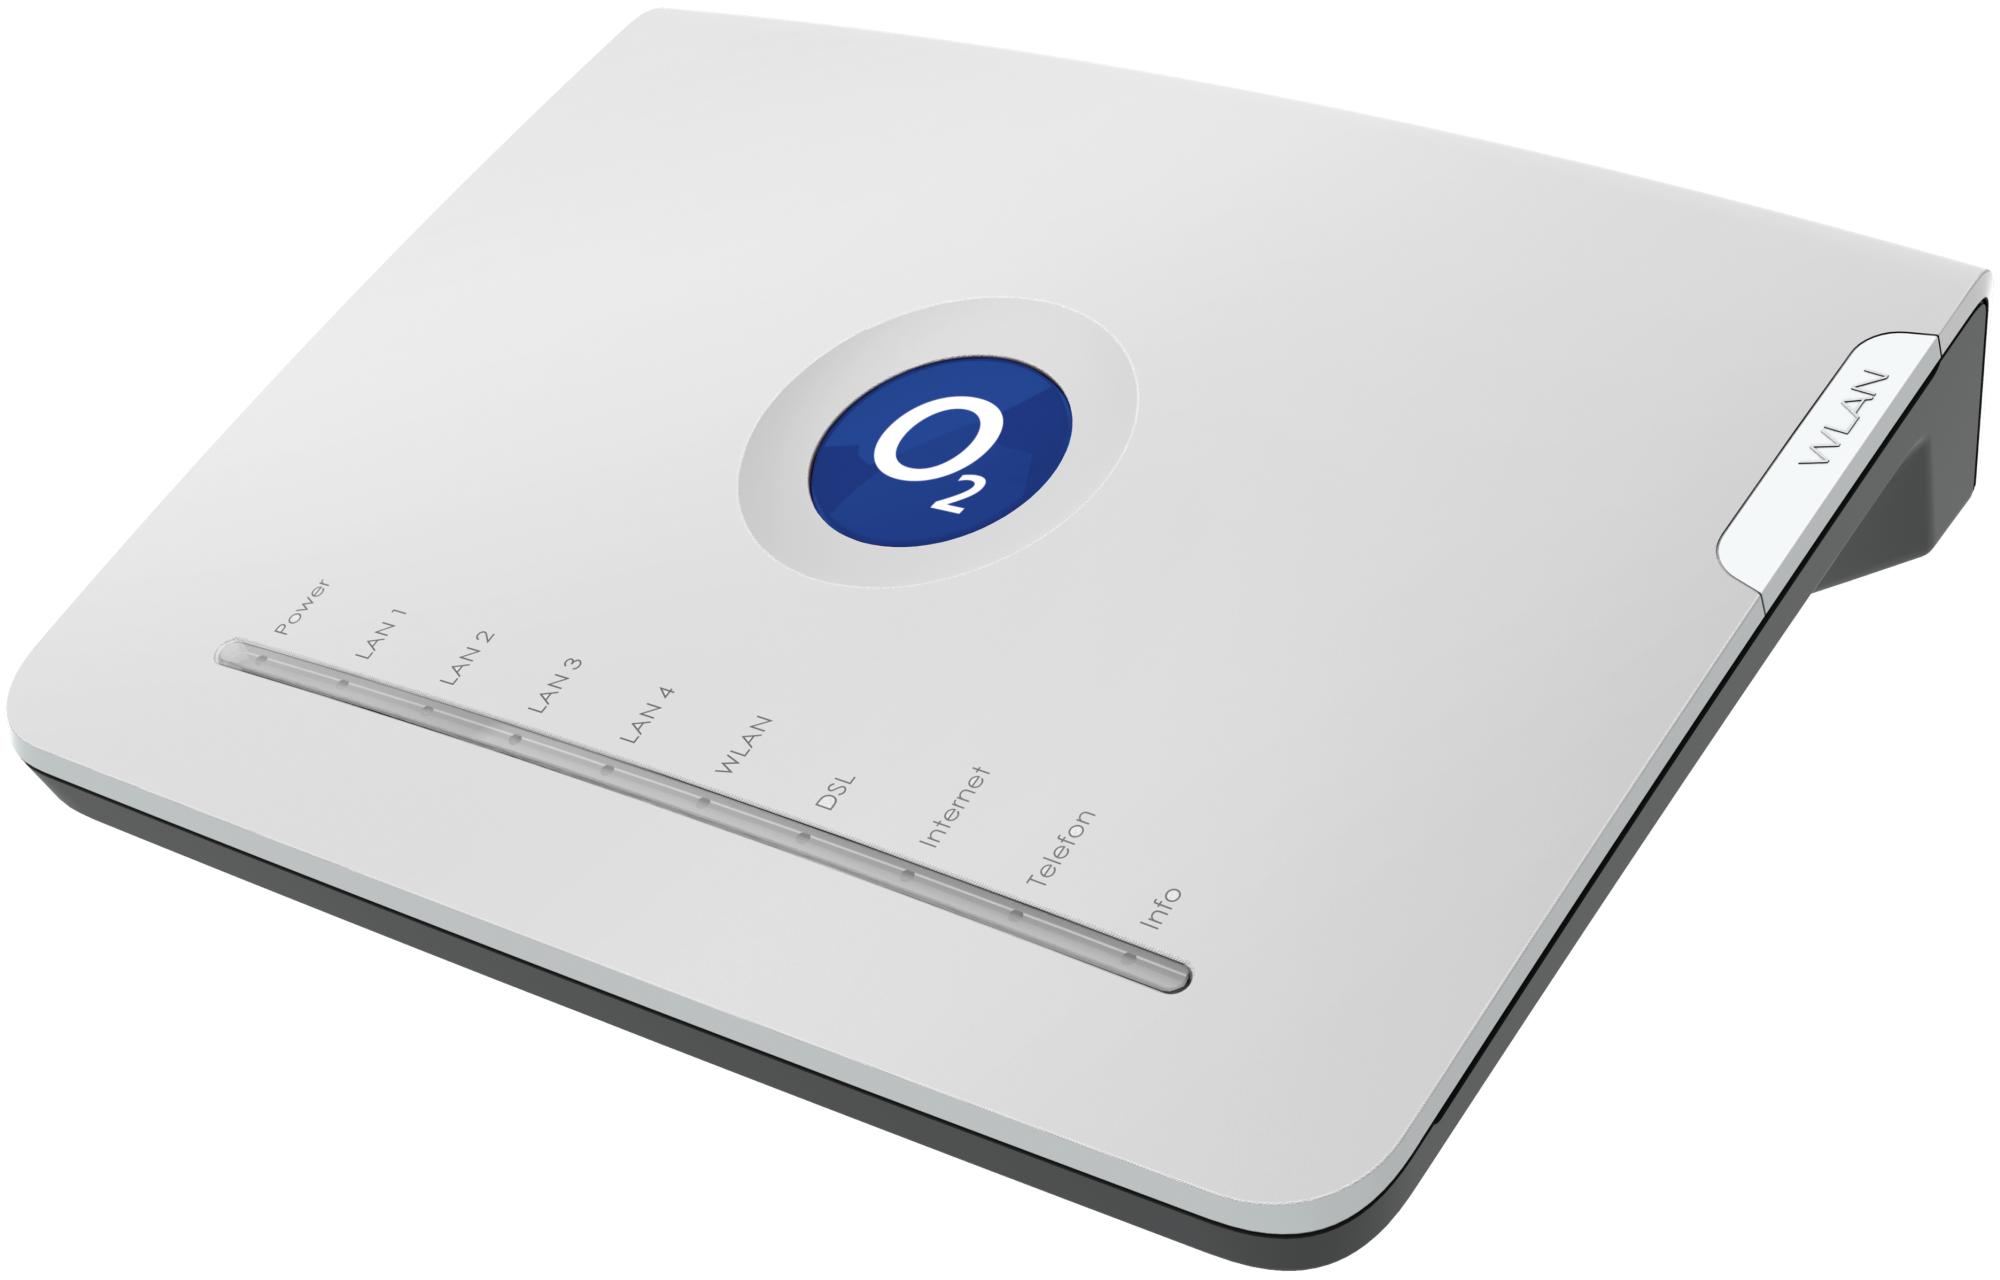 o2 router verwundbar jetzt wlan passwort ndern heise security. Black Bedroom Furniture Sets. Home Design Ideas